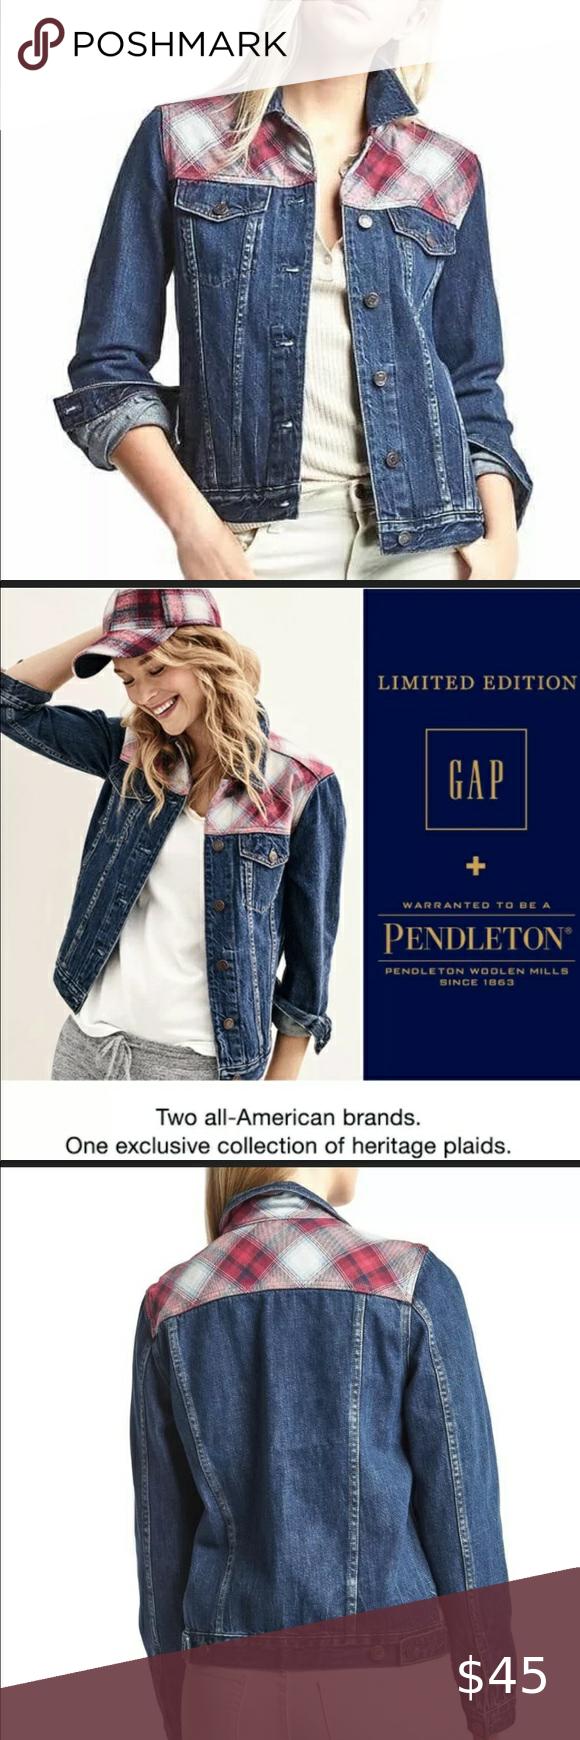 Gap Pendleton Denim Jean Jacket Xl Nwt Gap Pendleton Wool 1969 Denim Jean Jacket Xl Nwt Armpit To Armpit 22 Jean Jacket Clothes Design Denim Jean Jacket [ 1740 x 580 Pixel ]